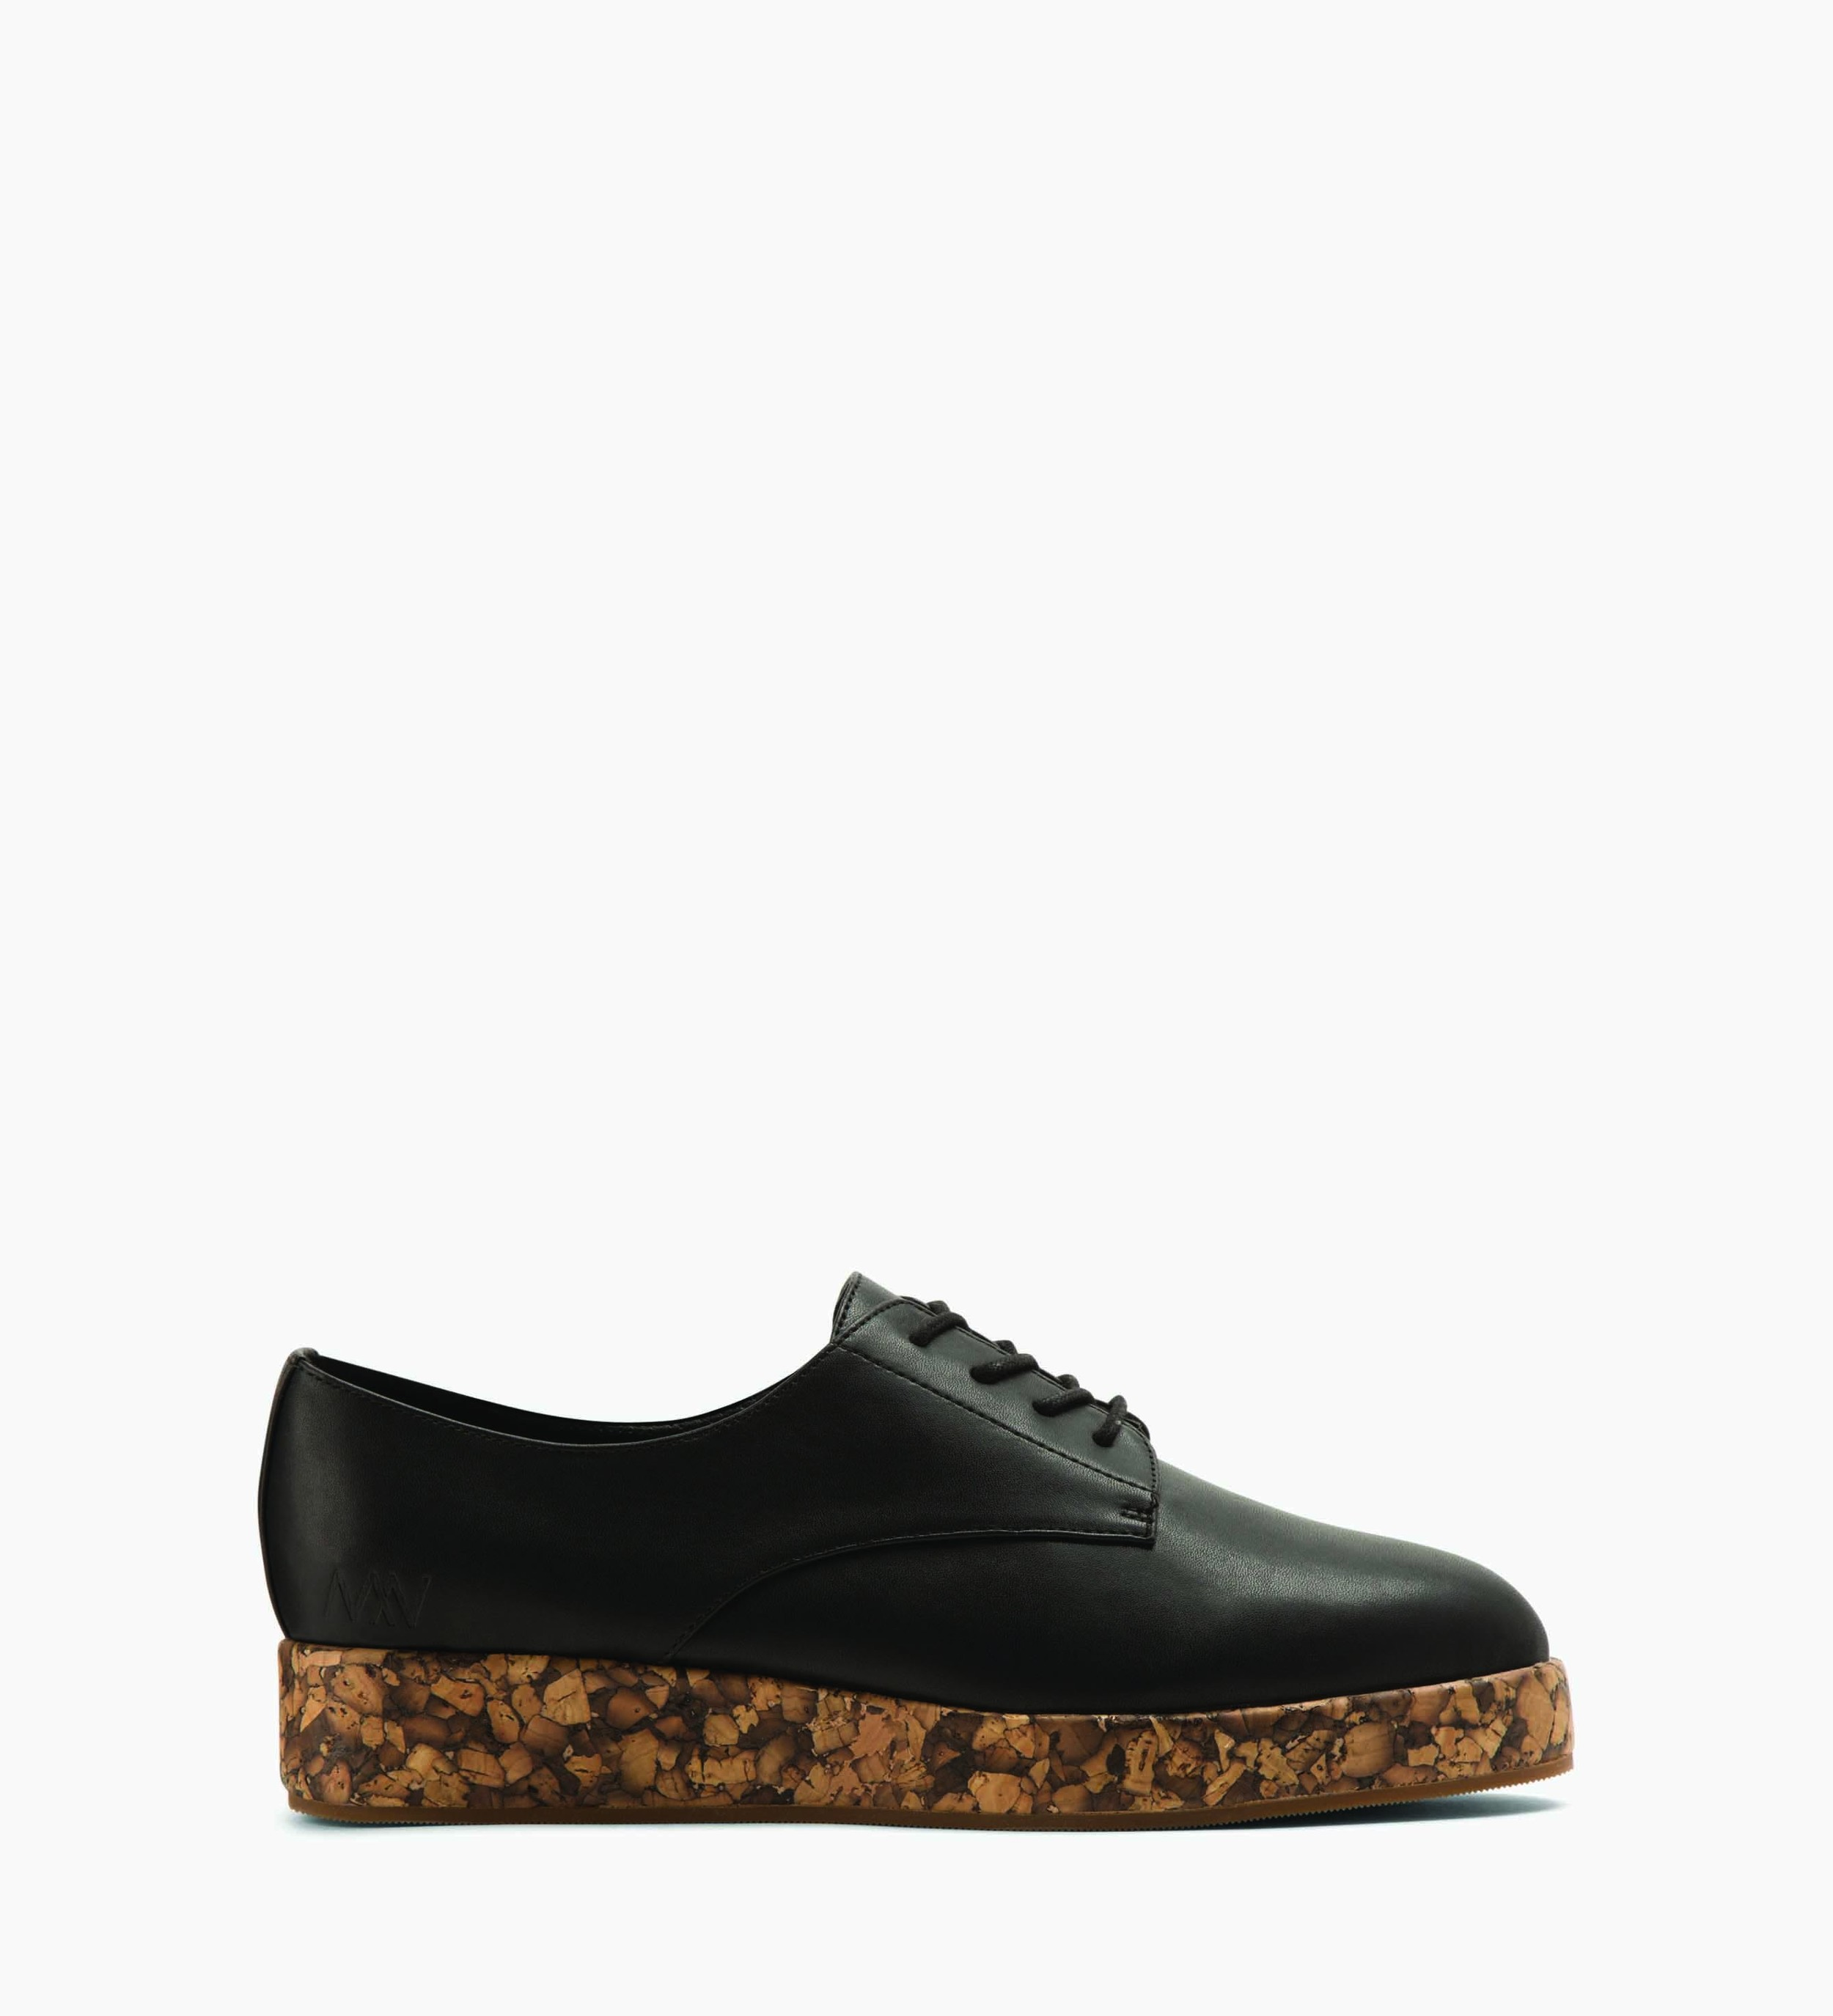 Hall Shoe in Cork - USD $120